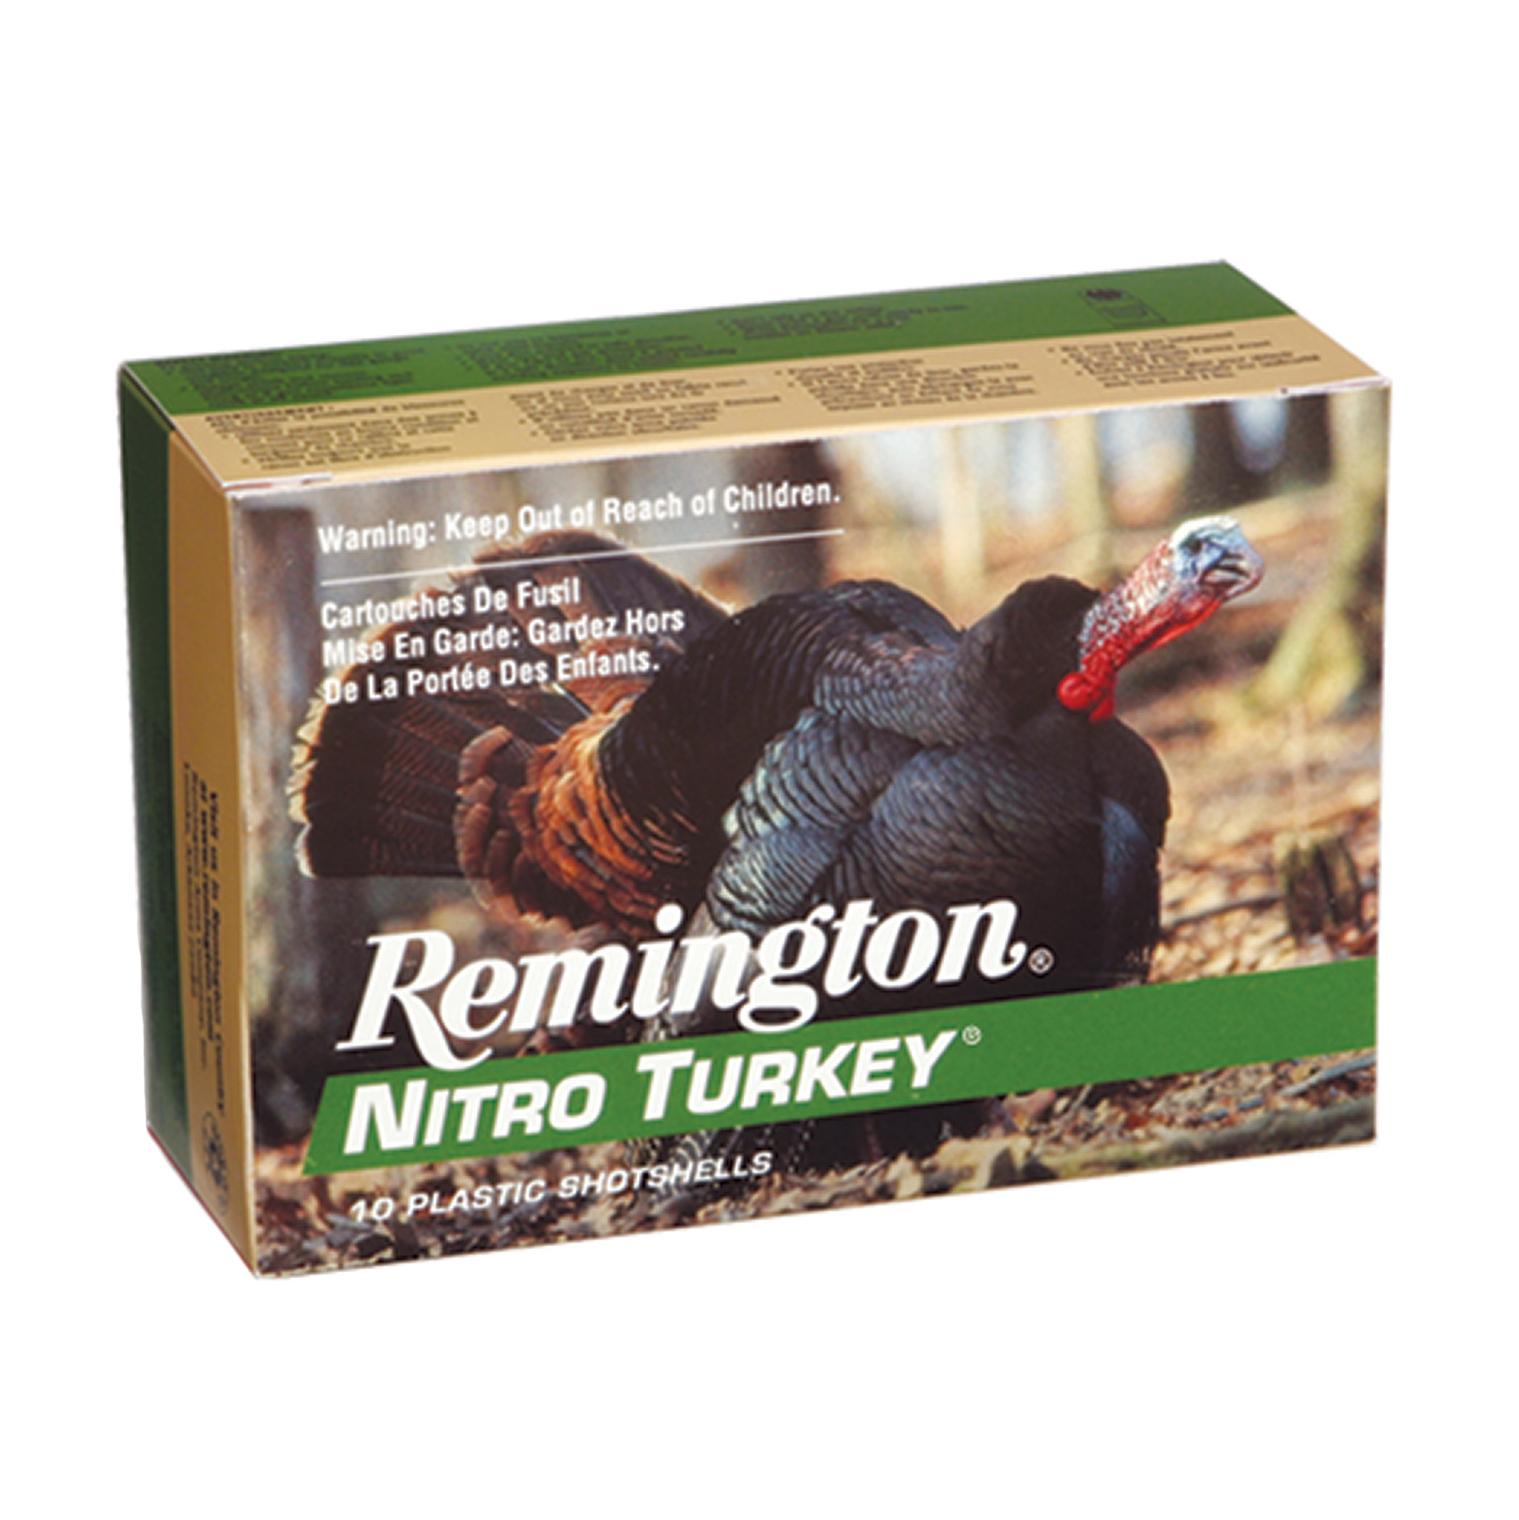 Remington Nitro Turkey Buffered Loads, 12-ga, 3″, 1-7/8 oz, #5